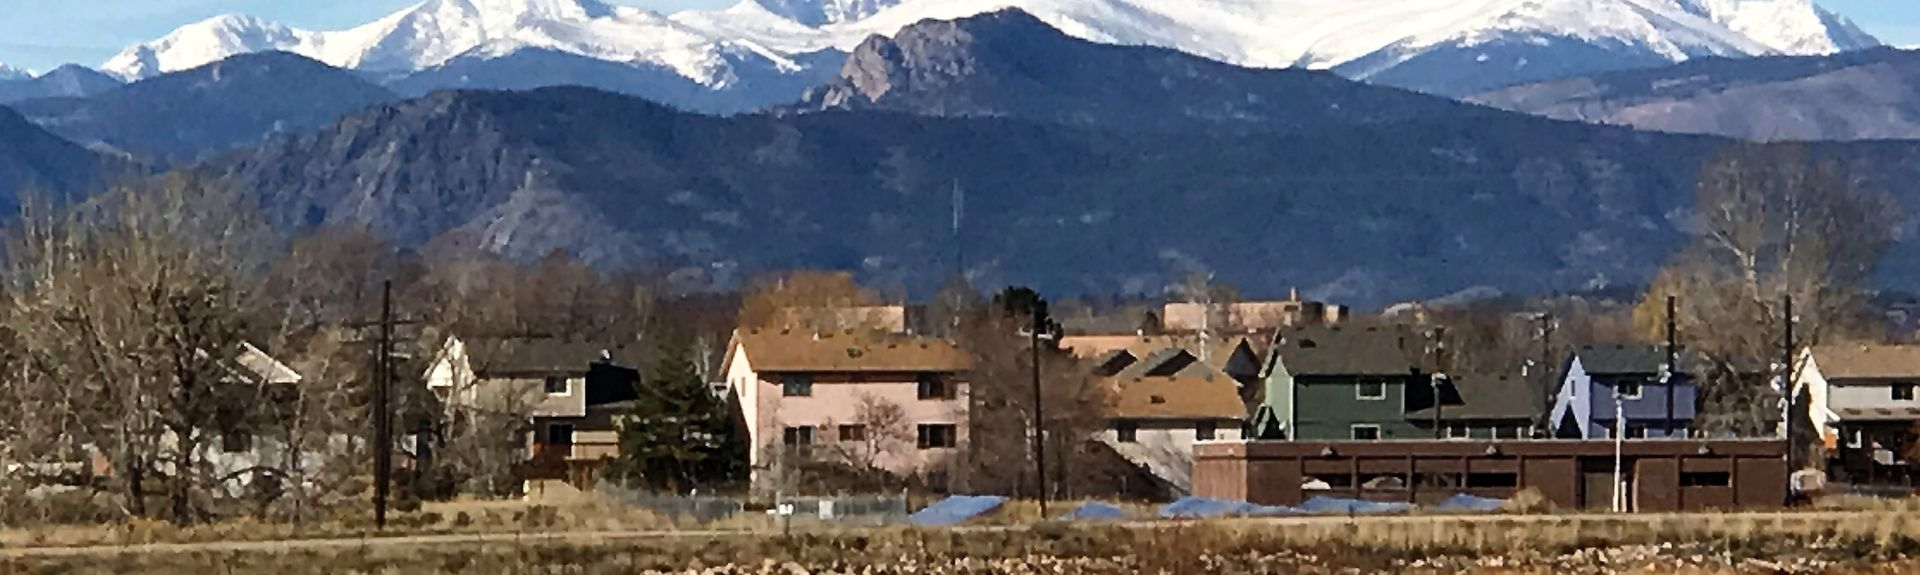 Greeley, Colorado, United States of America